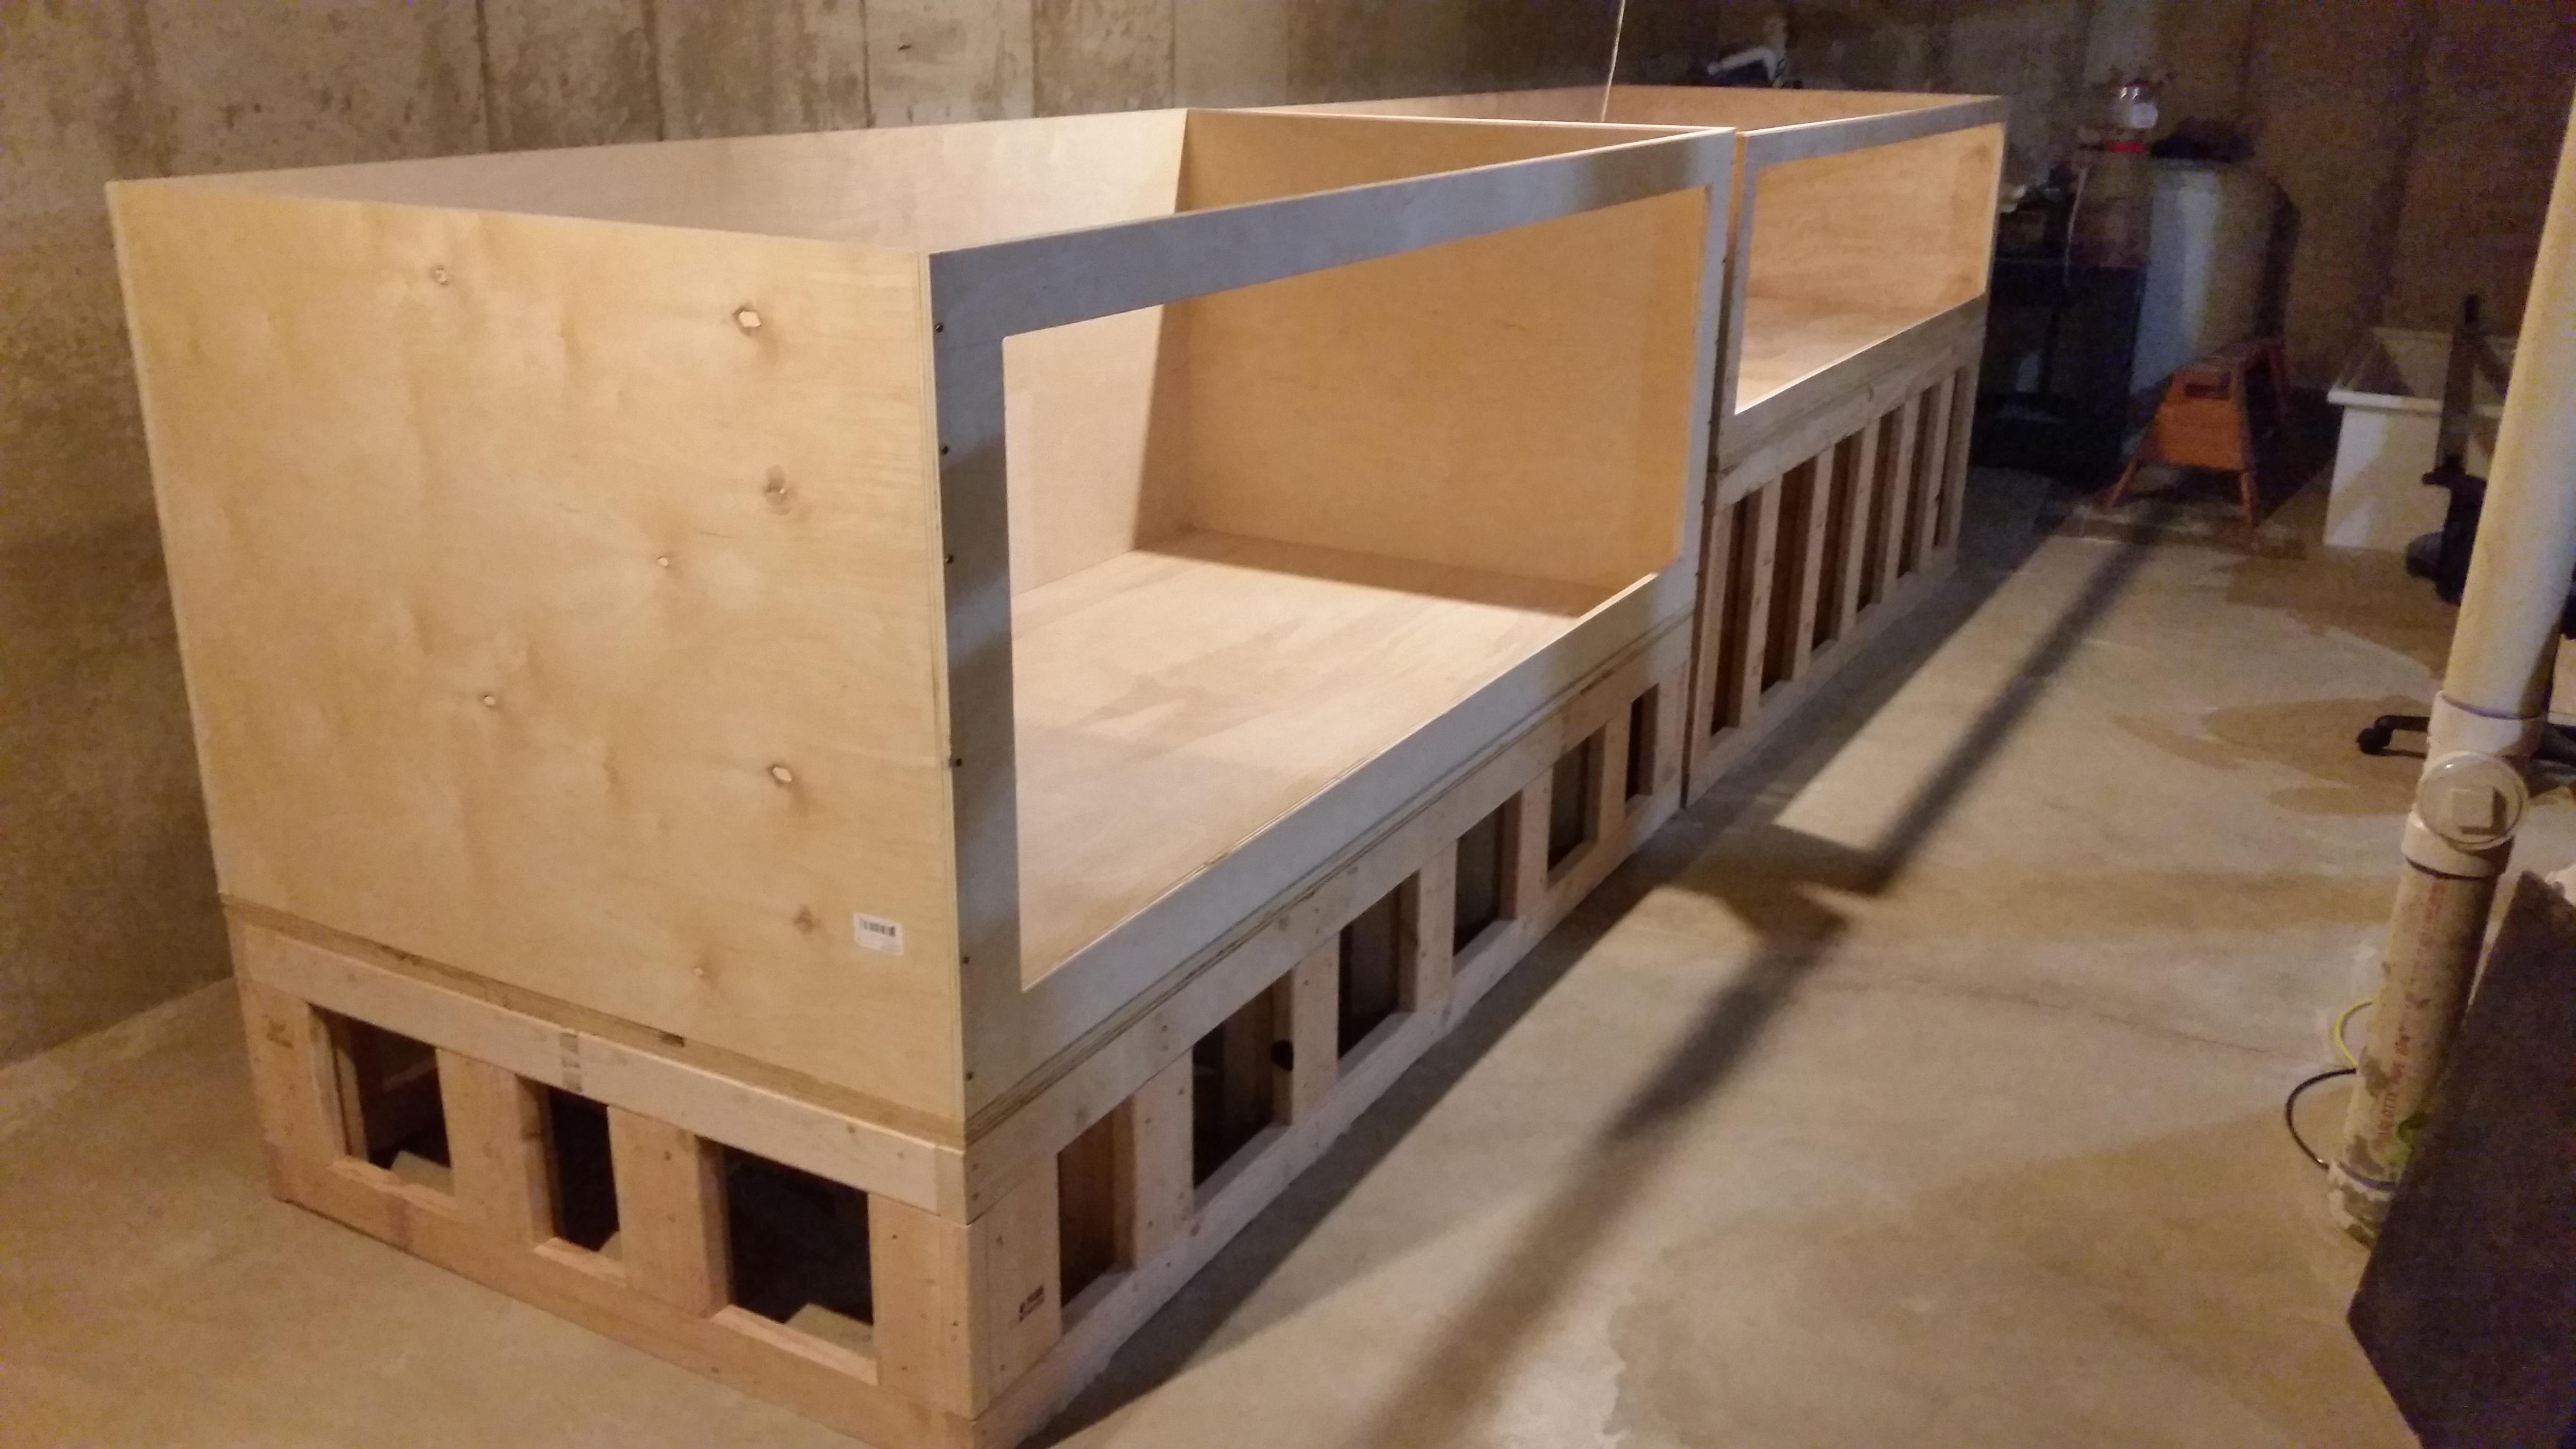 Alexgs Bat Plywood Build 2